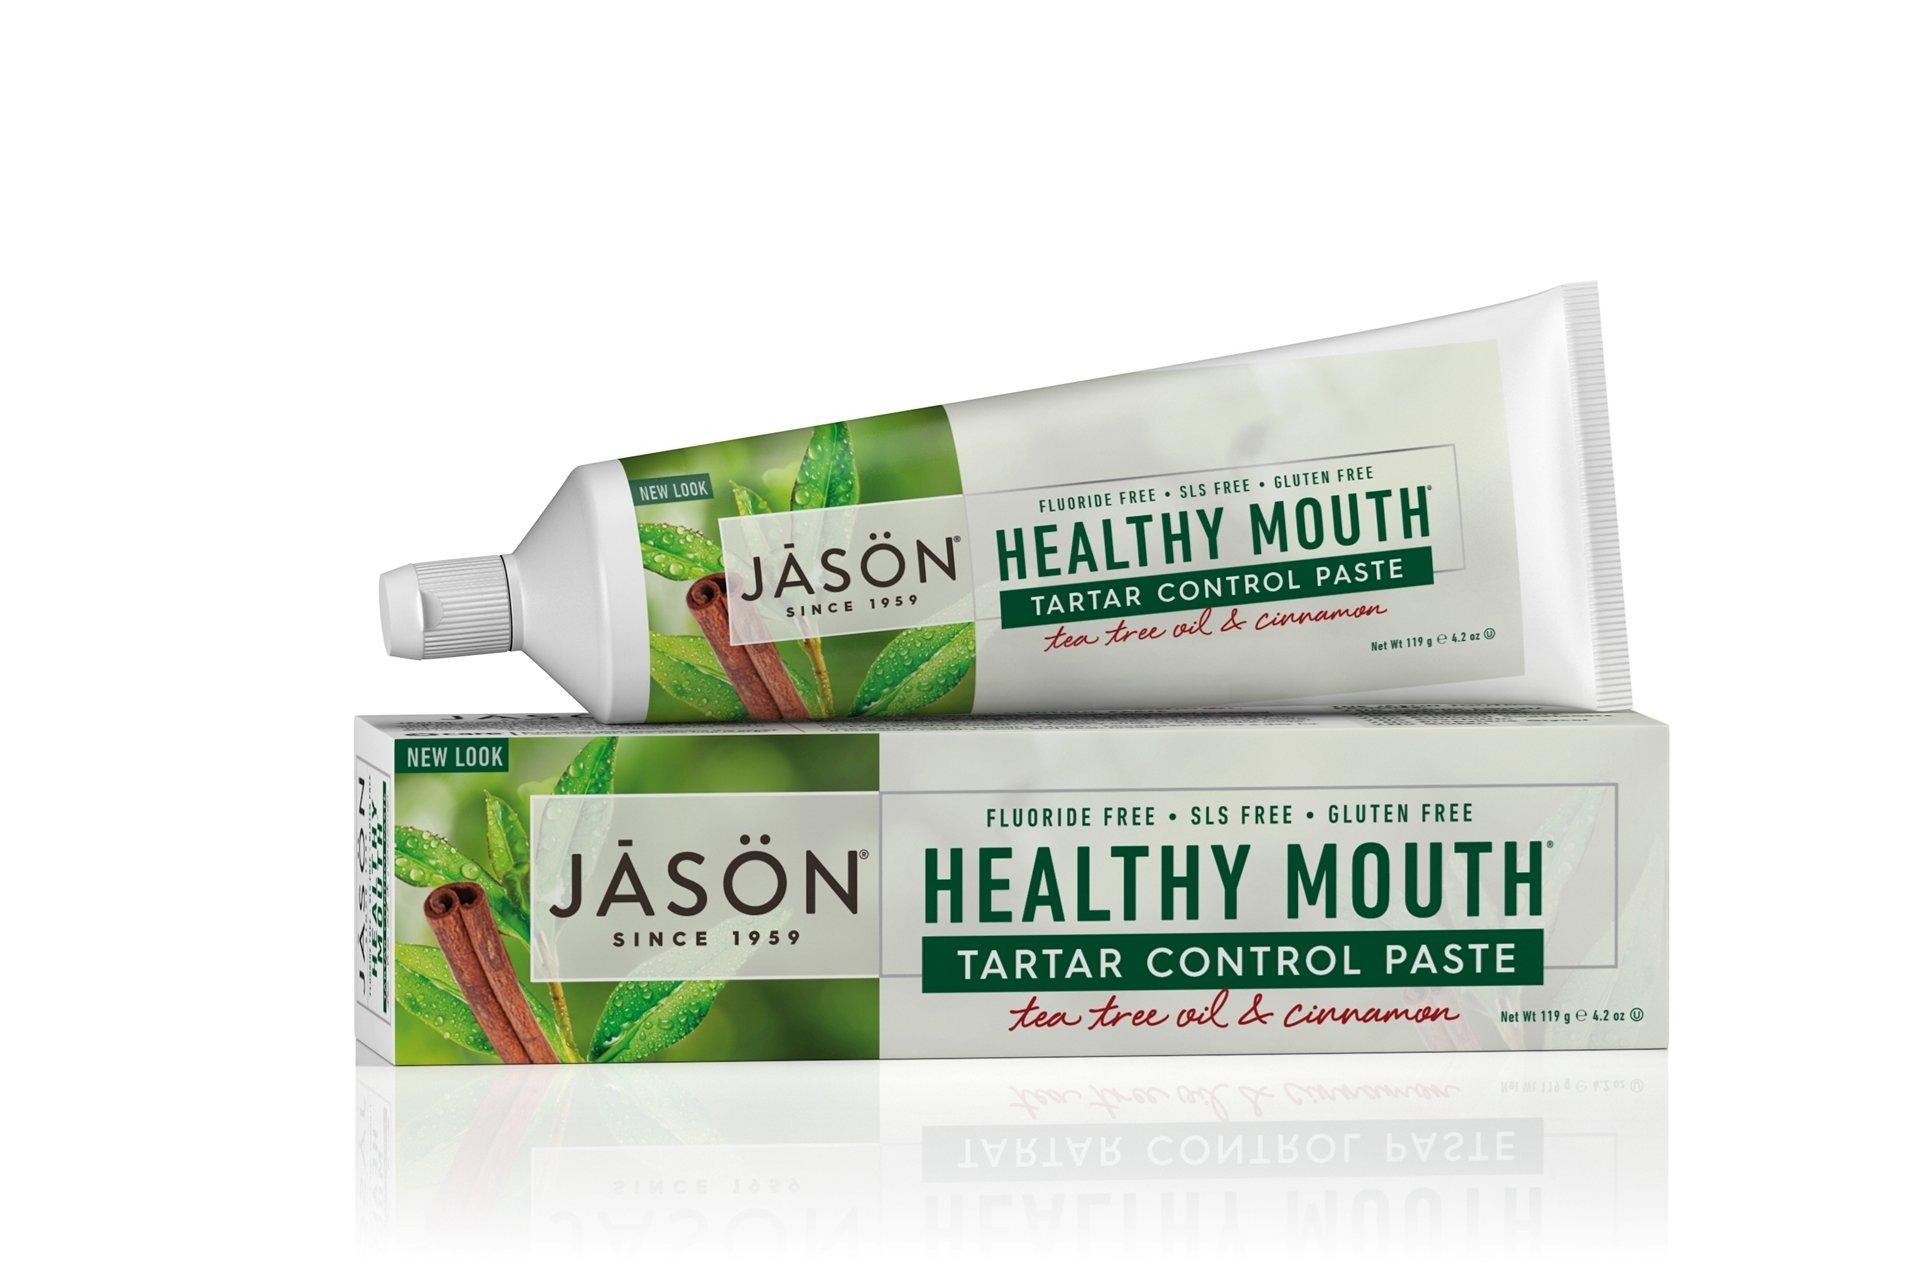 Jason Healthy Mouth